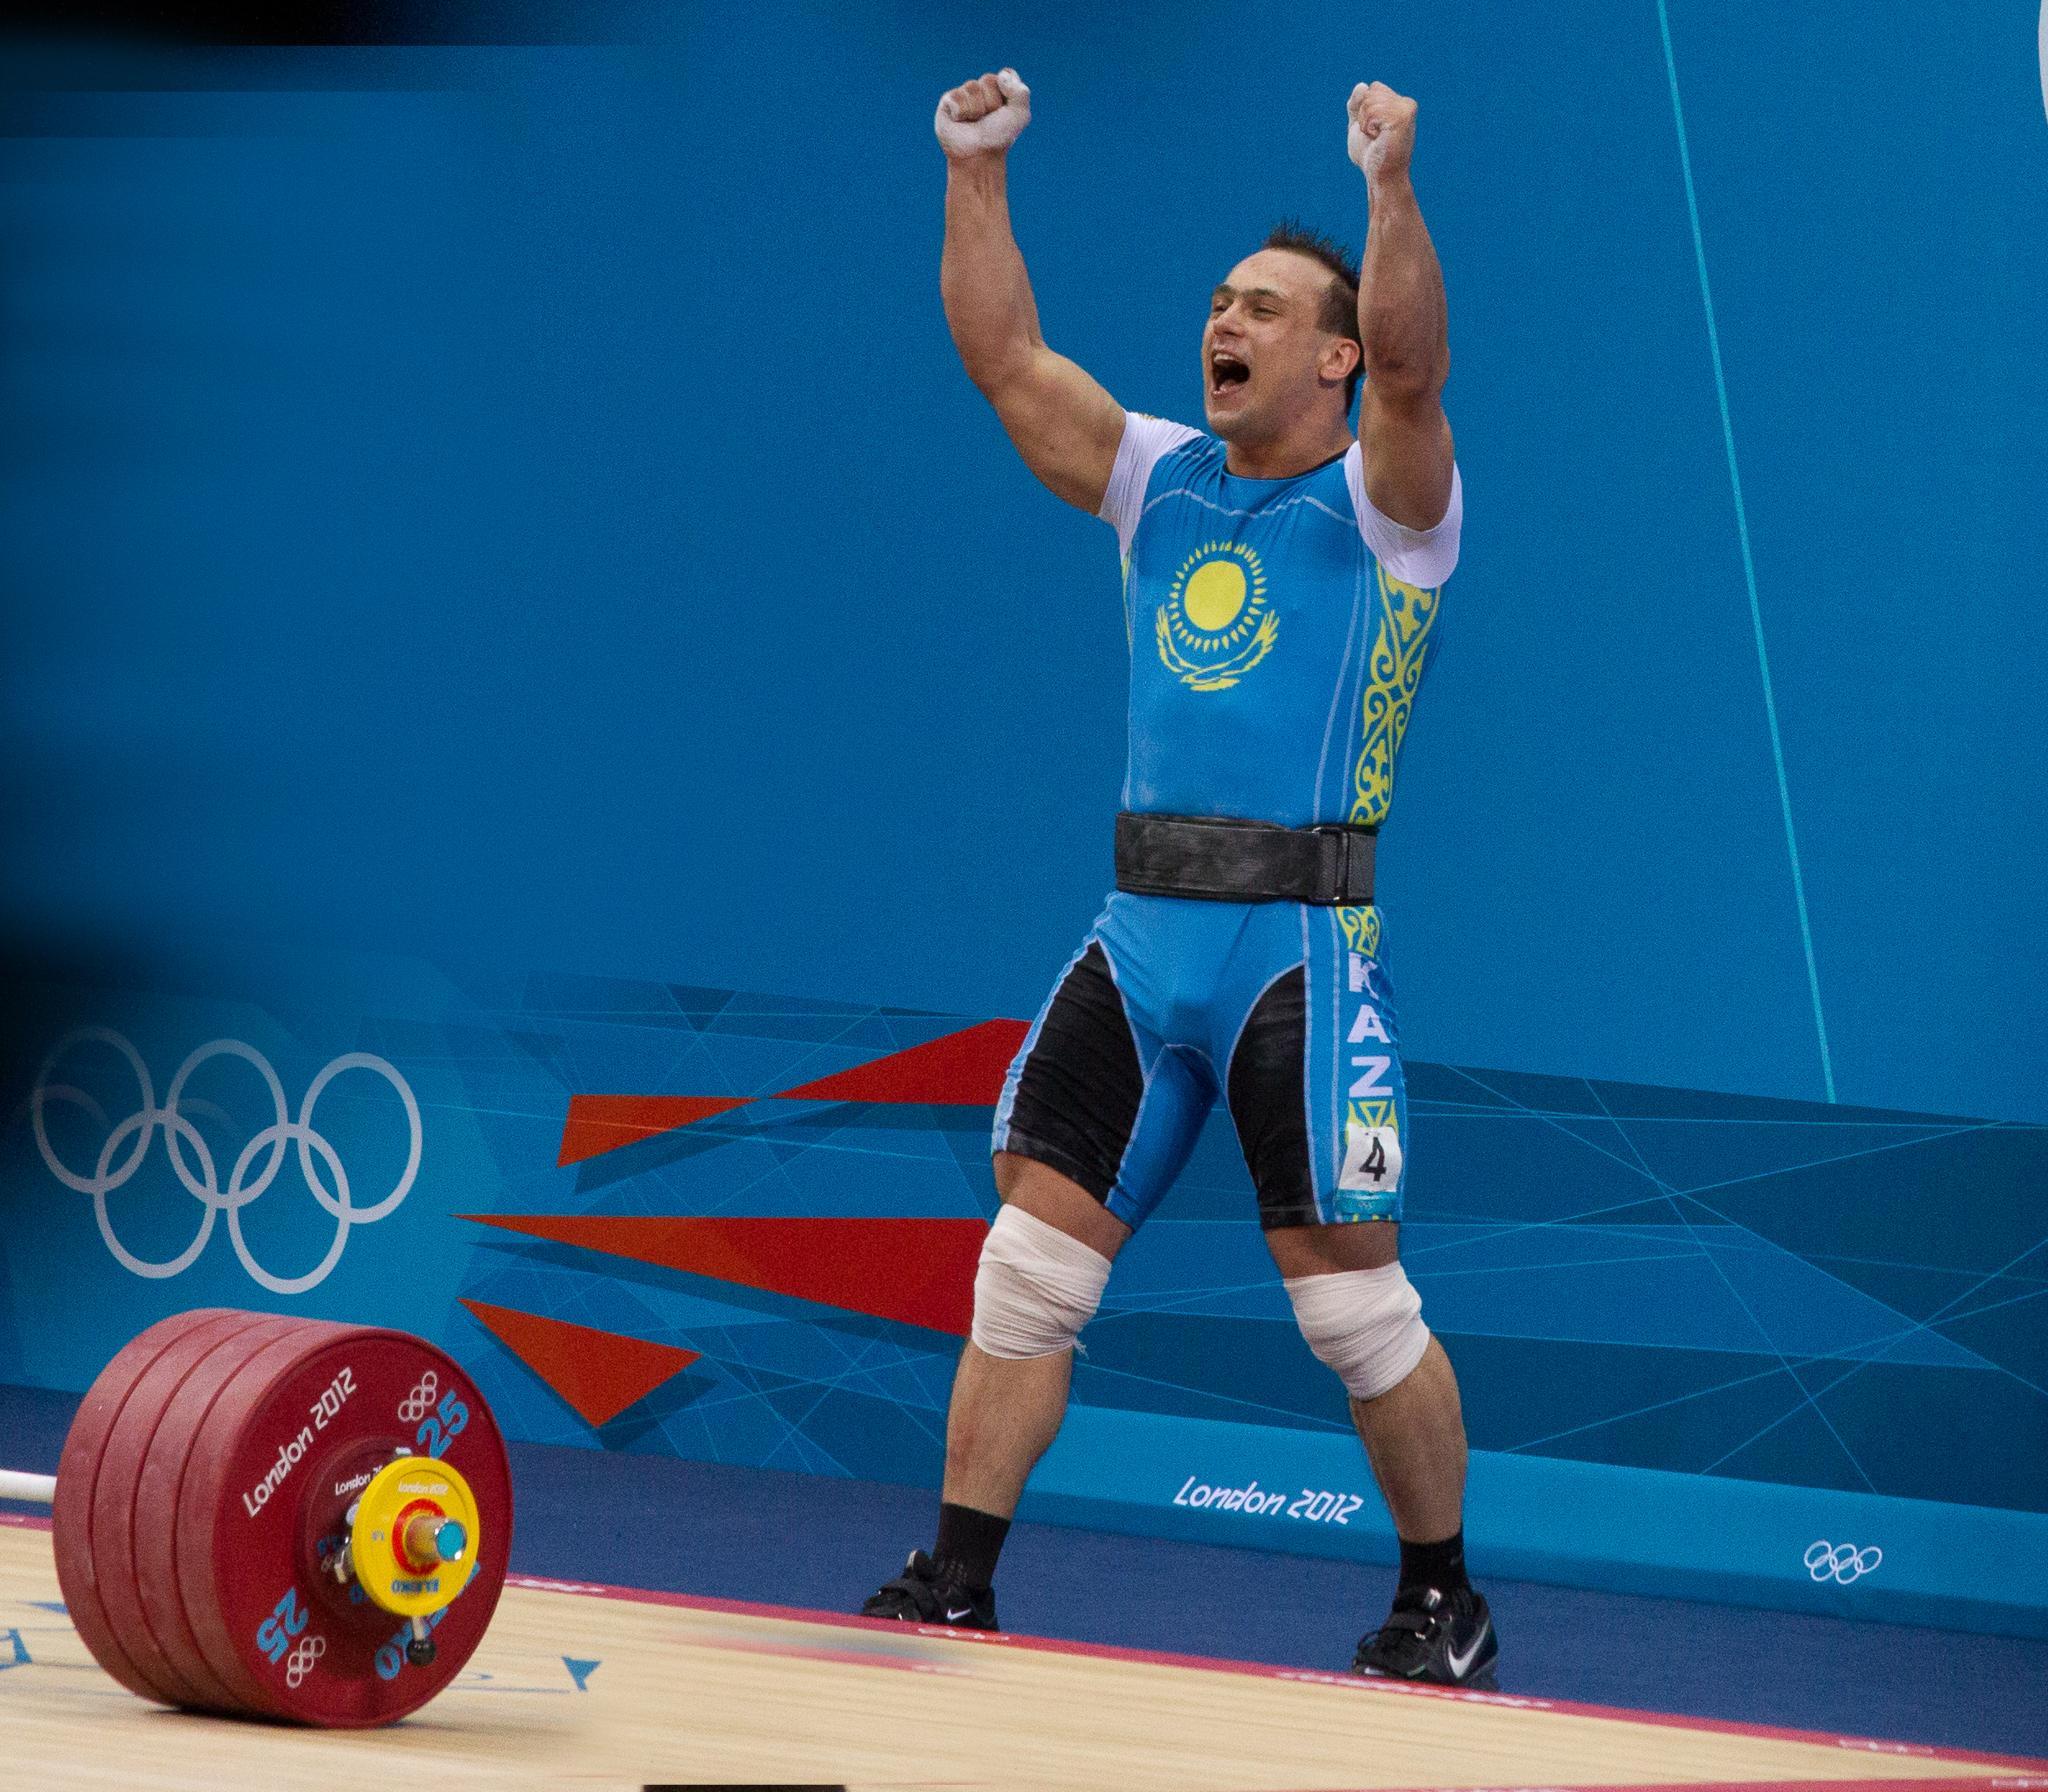 Ilya Ilyin clean and jerks his 233 world record Olympic winning lift